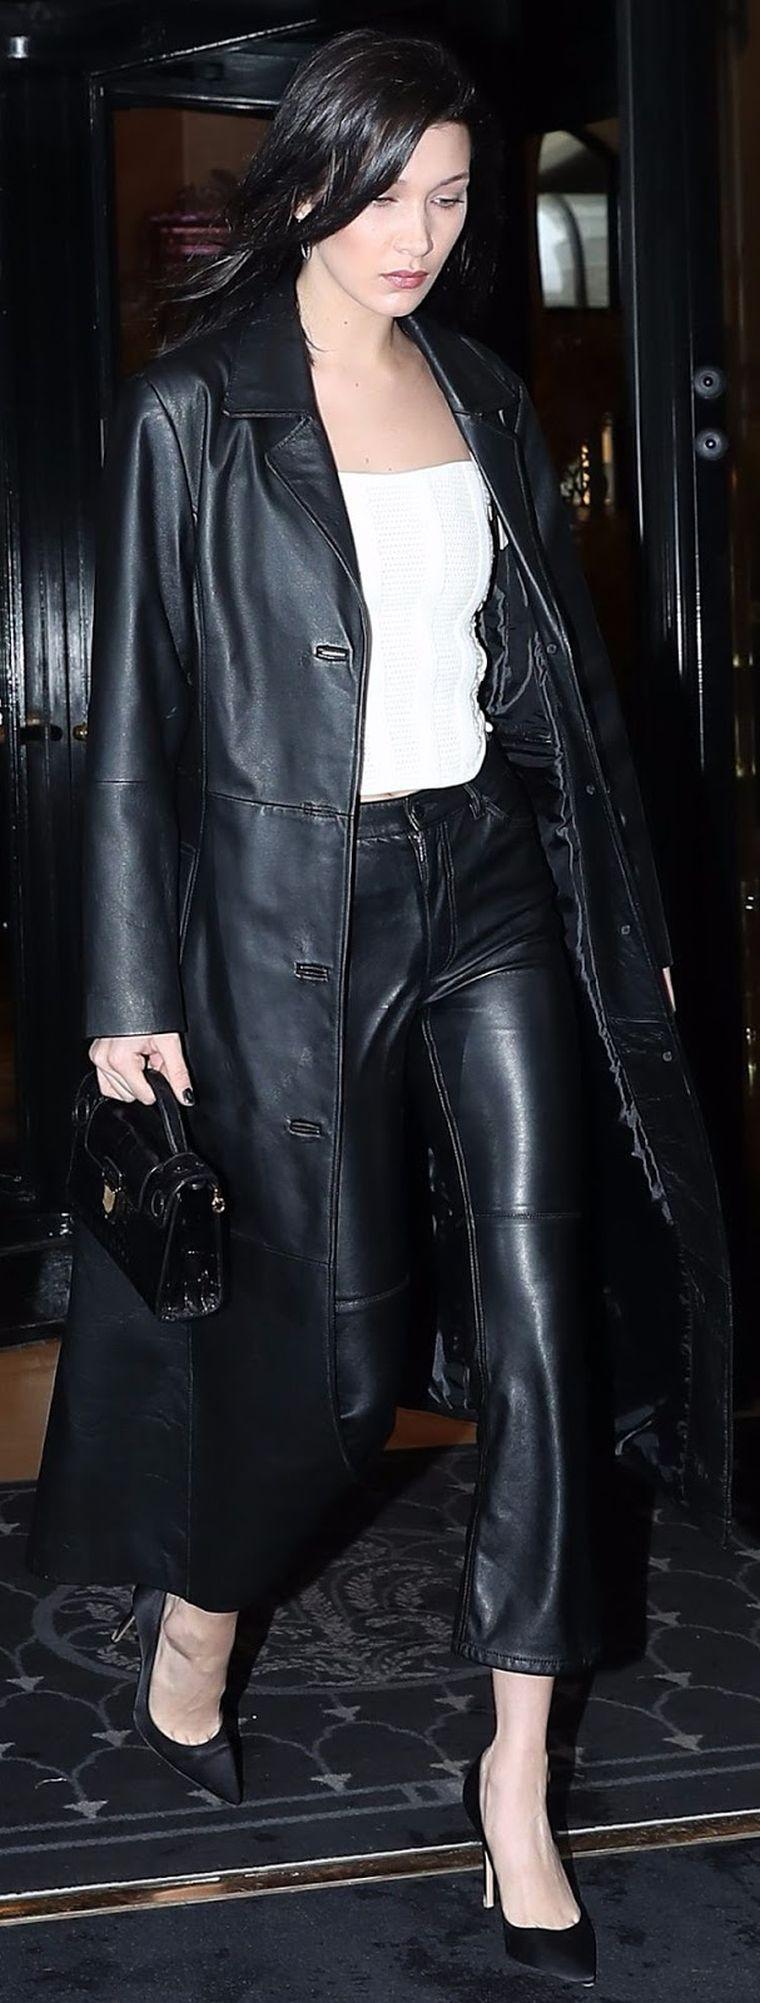 black leather outfit idea